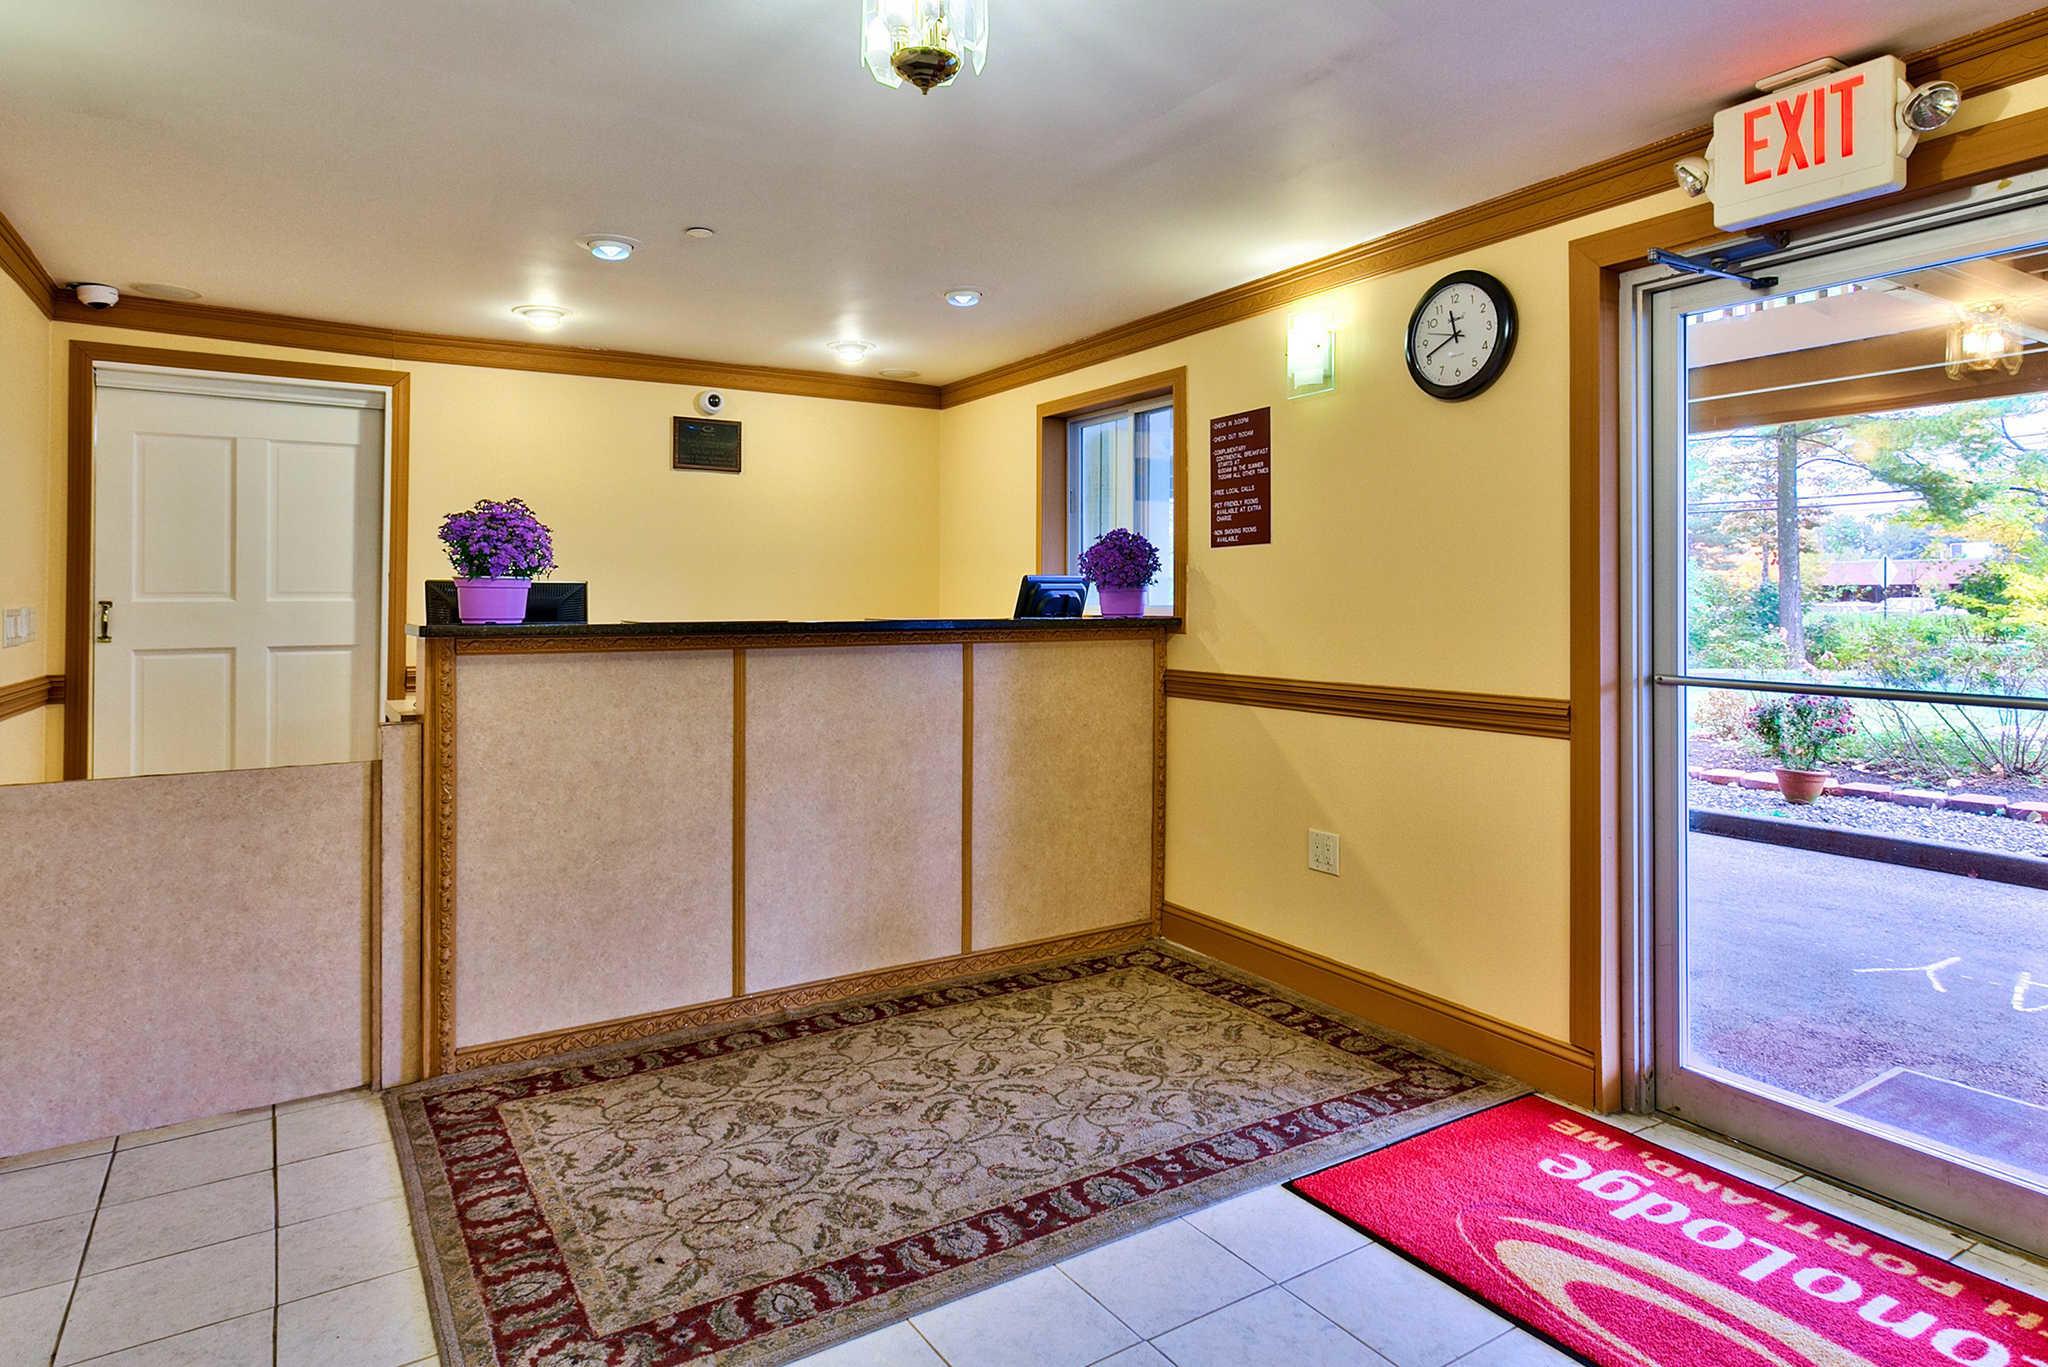 Econo Lodge Maine Mall image 2